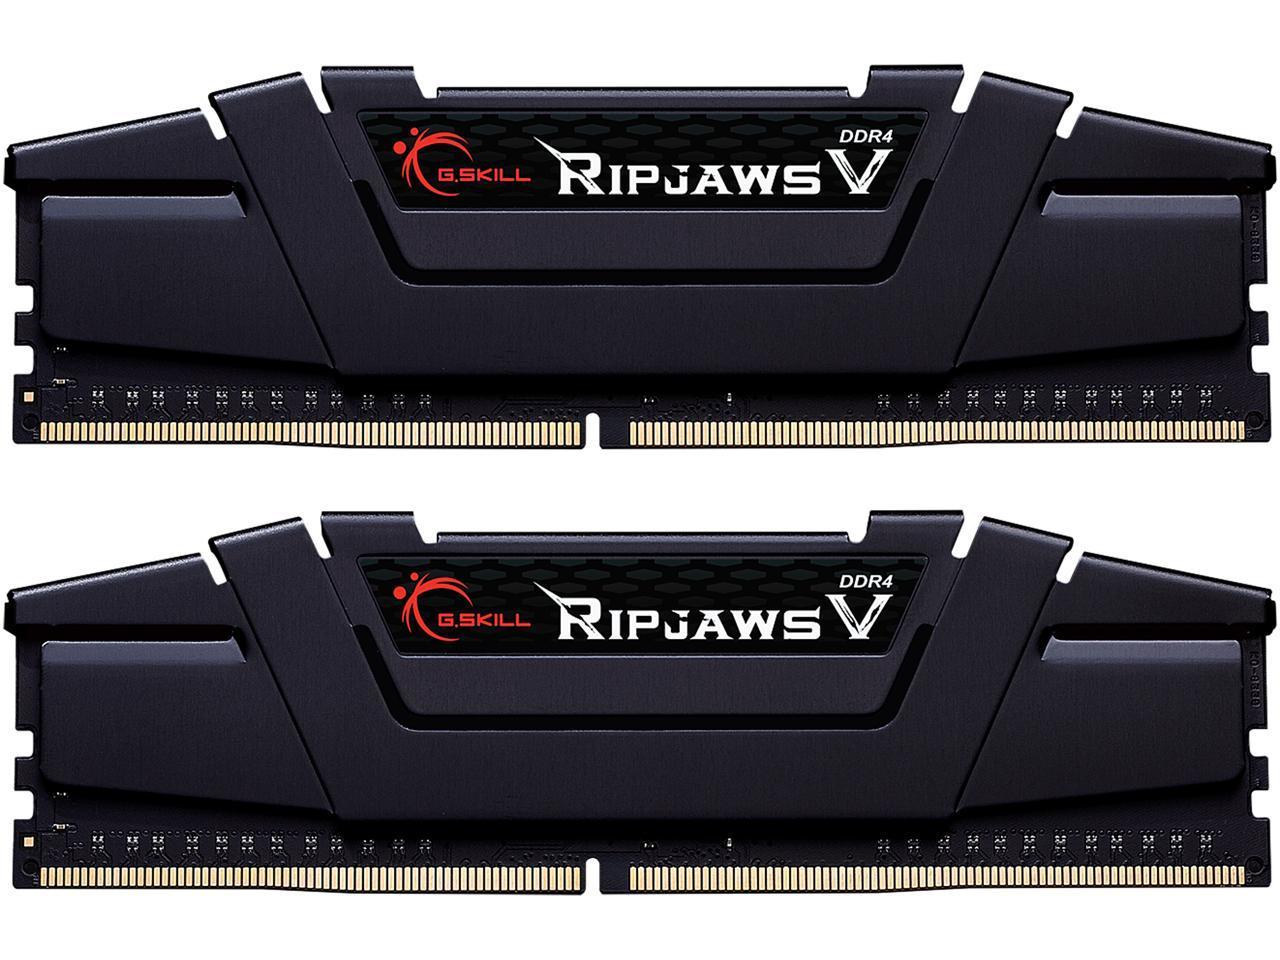 G.SKILL Ripjaws V Series 16GB (2 x 8GB) 288-Pin DDR4 SDRAM DDR4 5066 MHz - $150